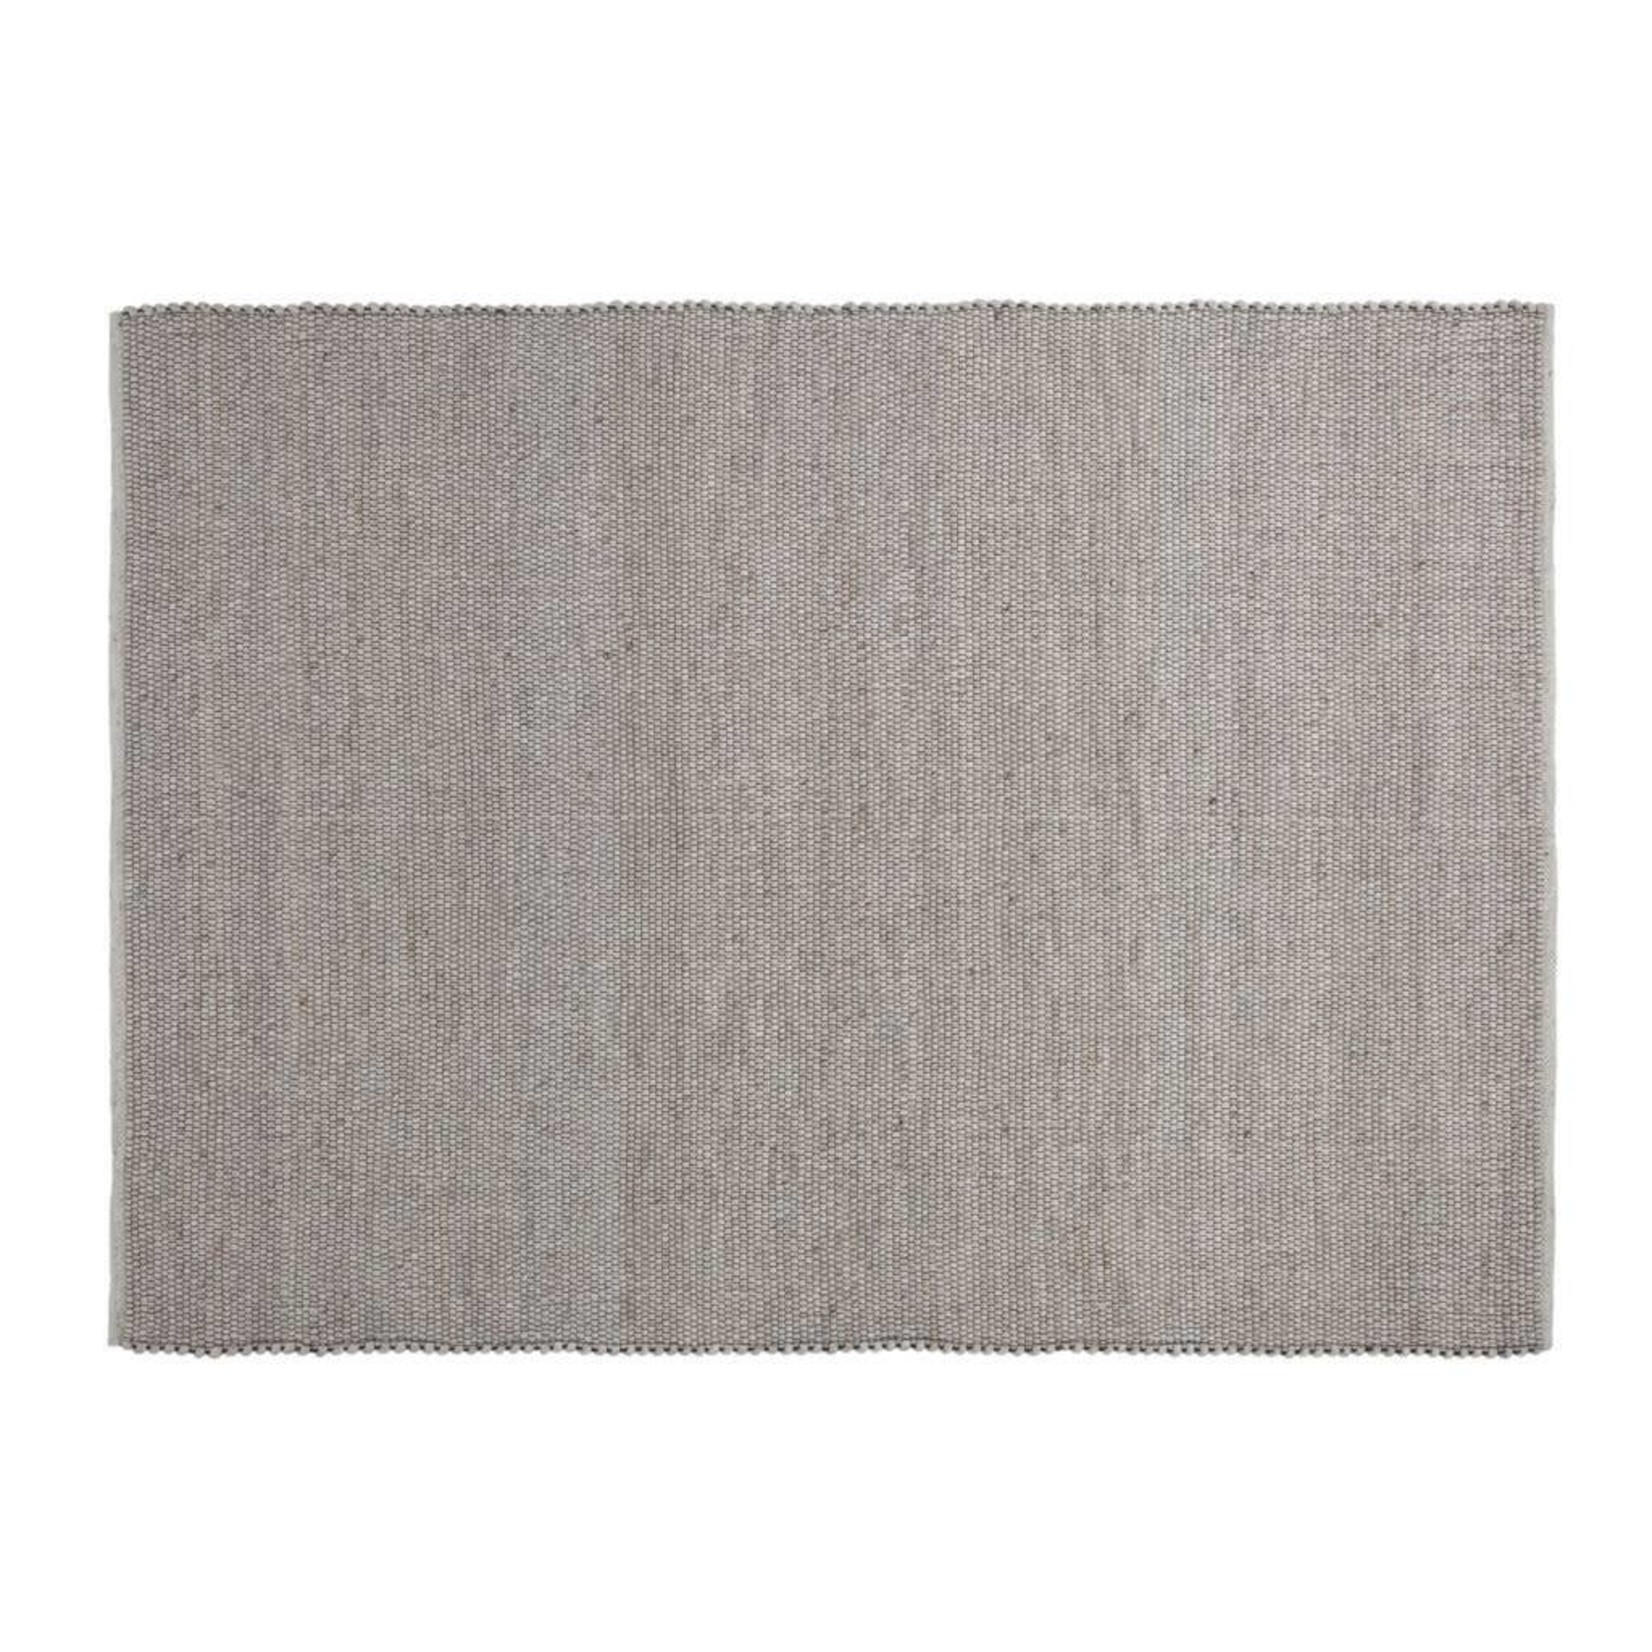 Brinker Carpets Brinker Carpets Mandala 101 160x230cm